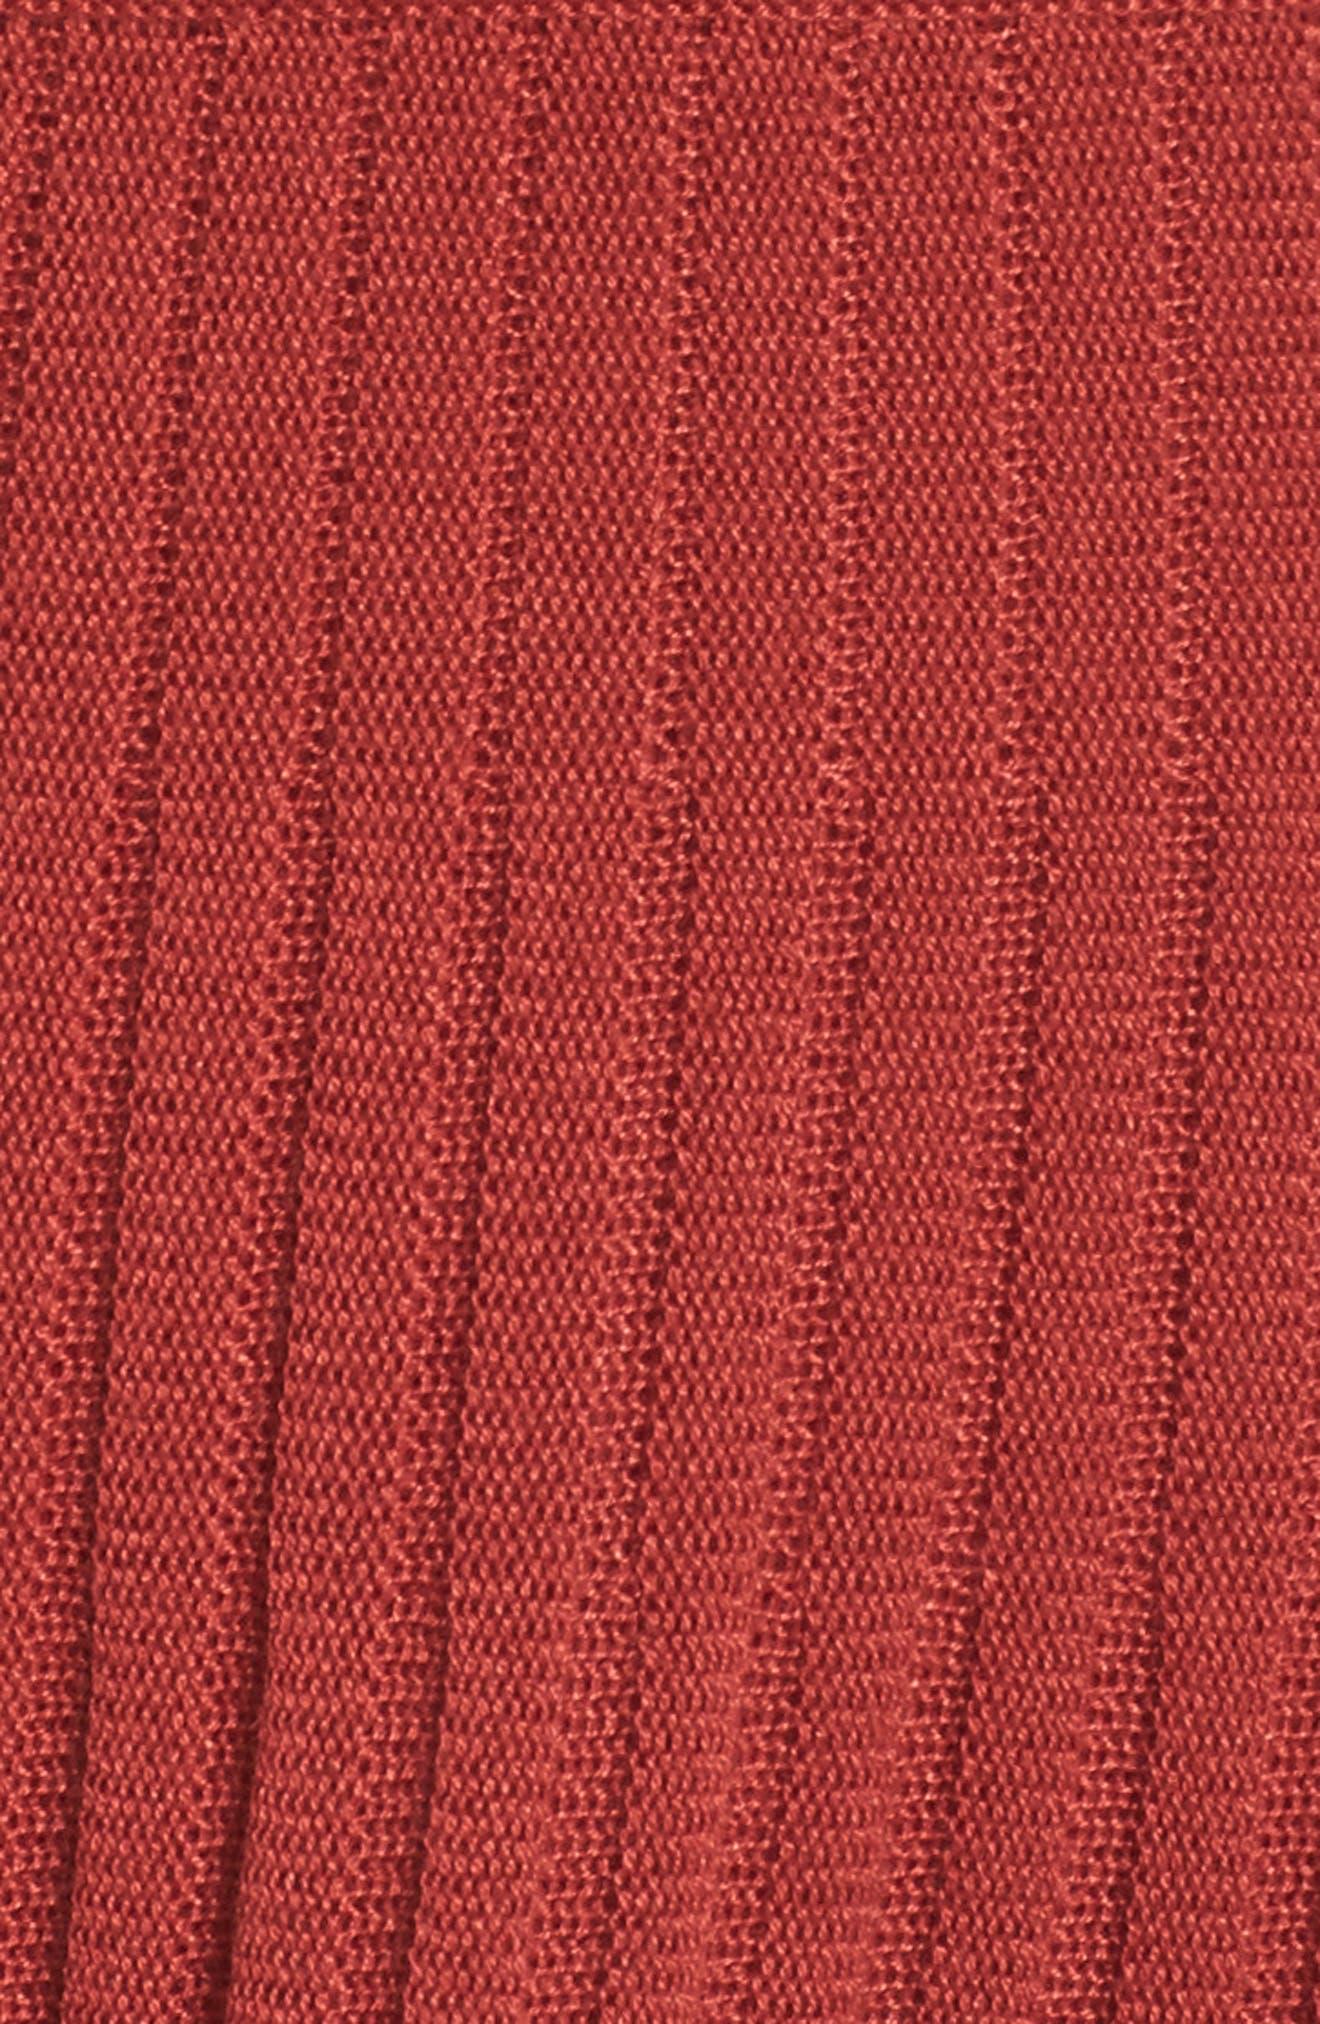 Private Concert Sweater Dress,                             Alternate thumbnail 5, color,                             600